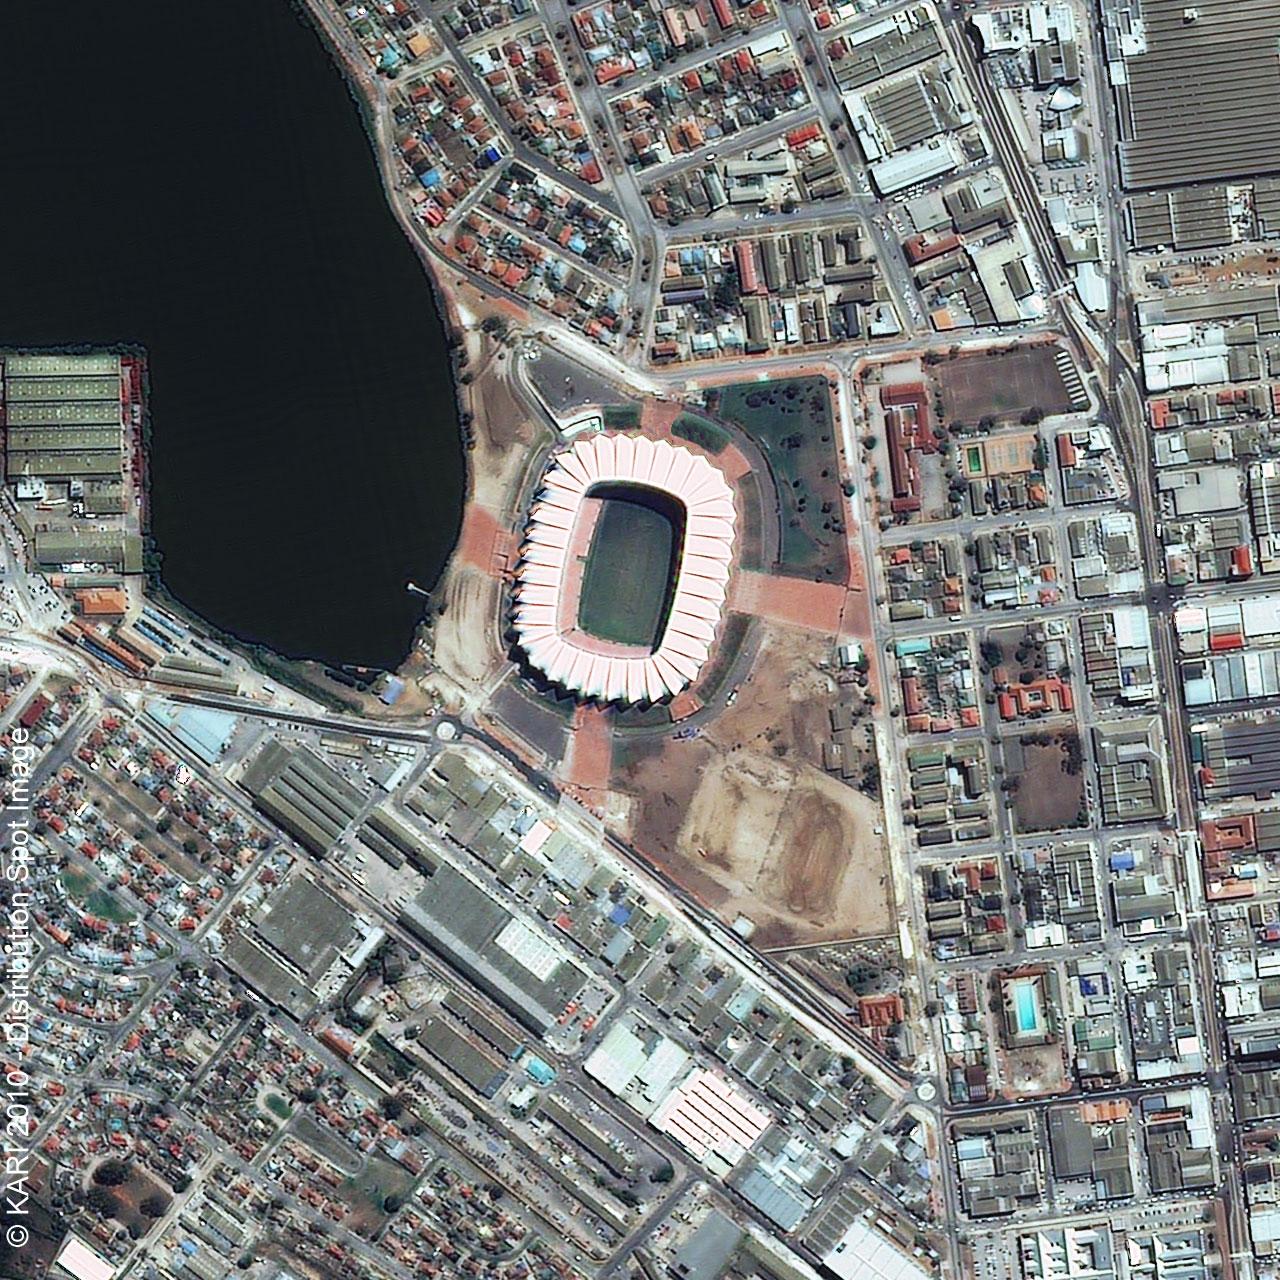 Port Elizabeth Stadium - Nelson Mandela Bay/Port Elizabeth